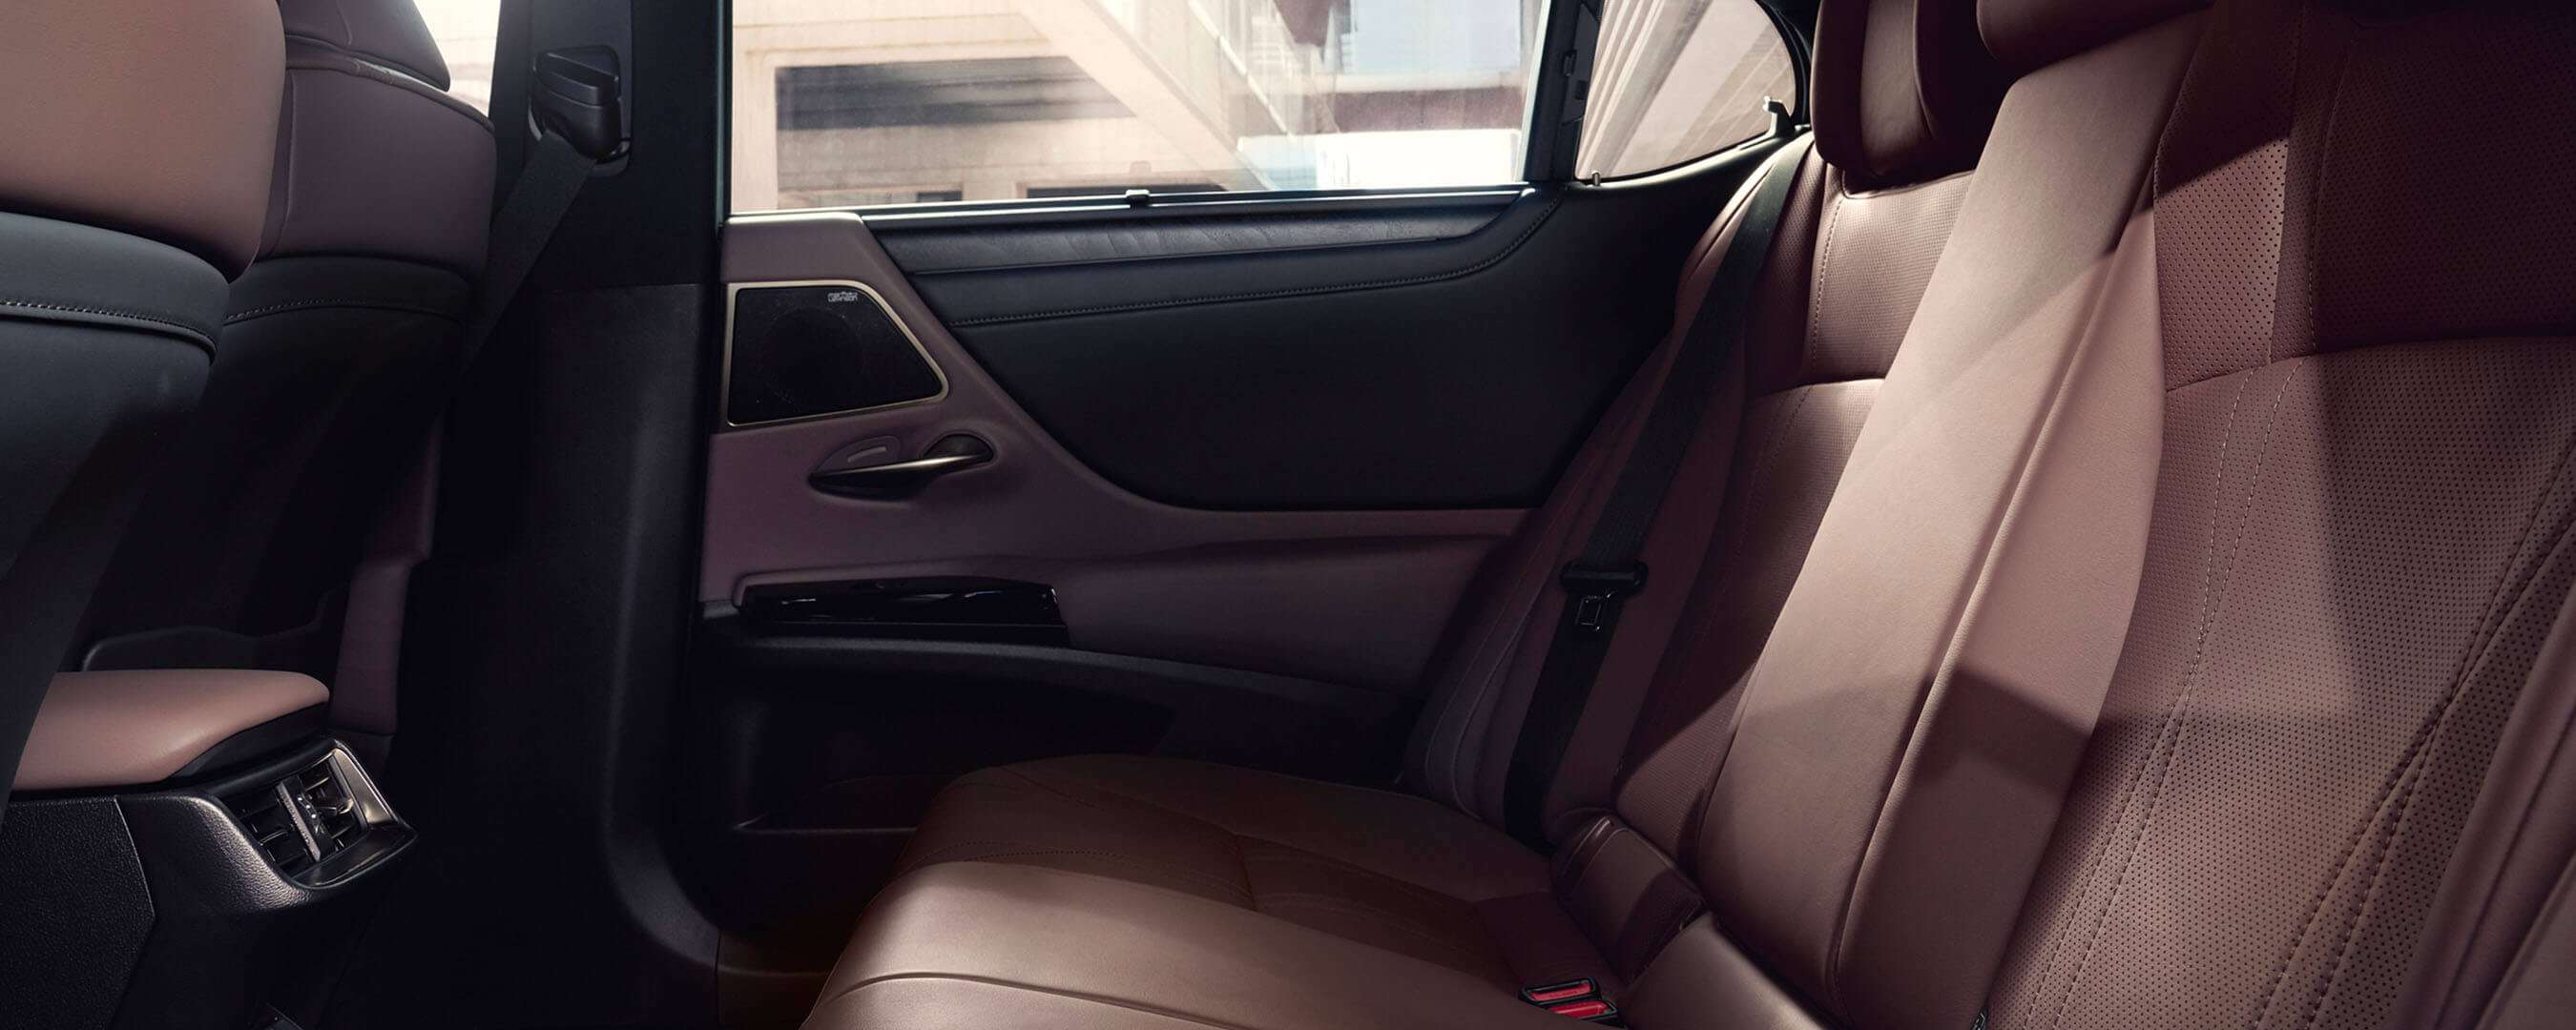 2022 RU lexus es overview experience hero interior back